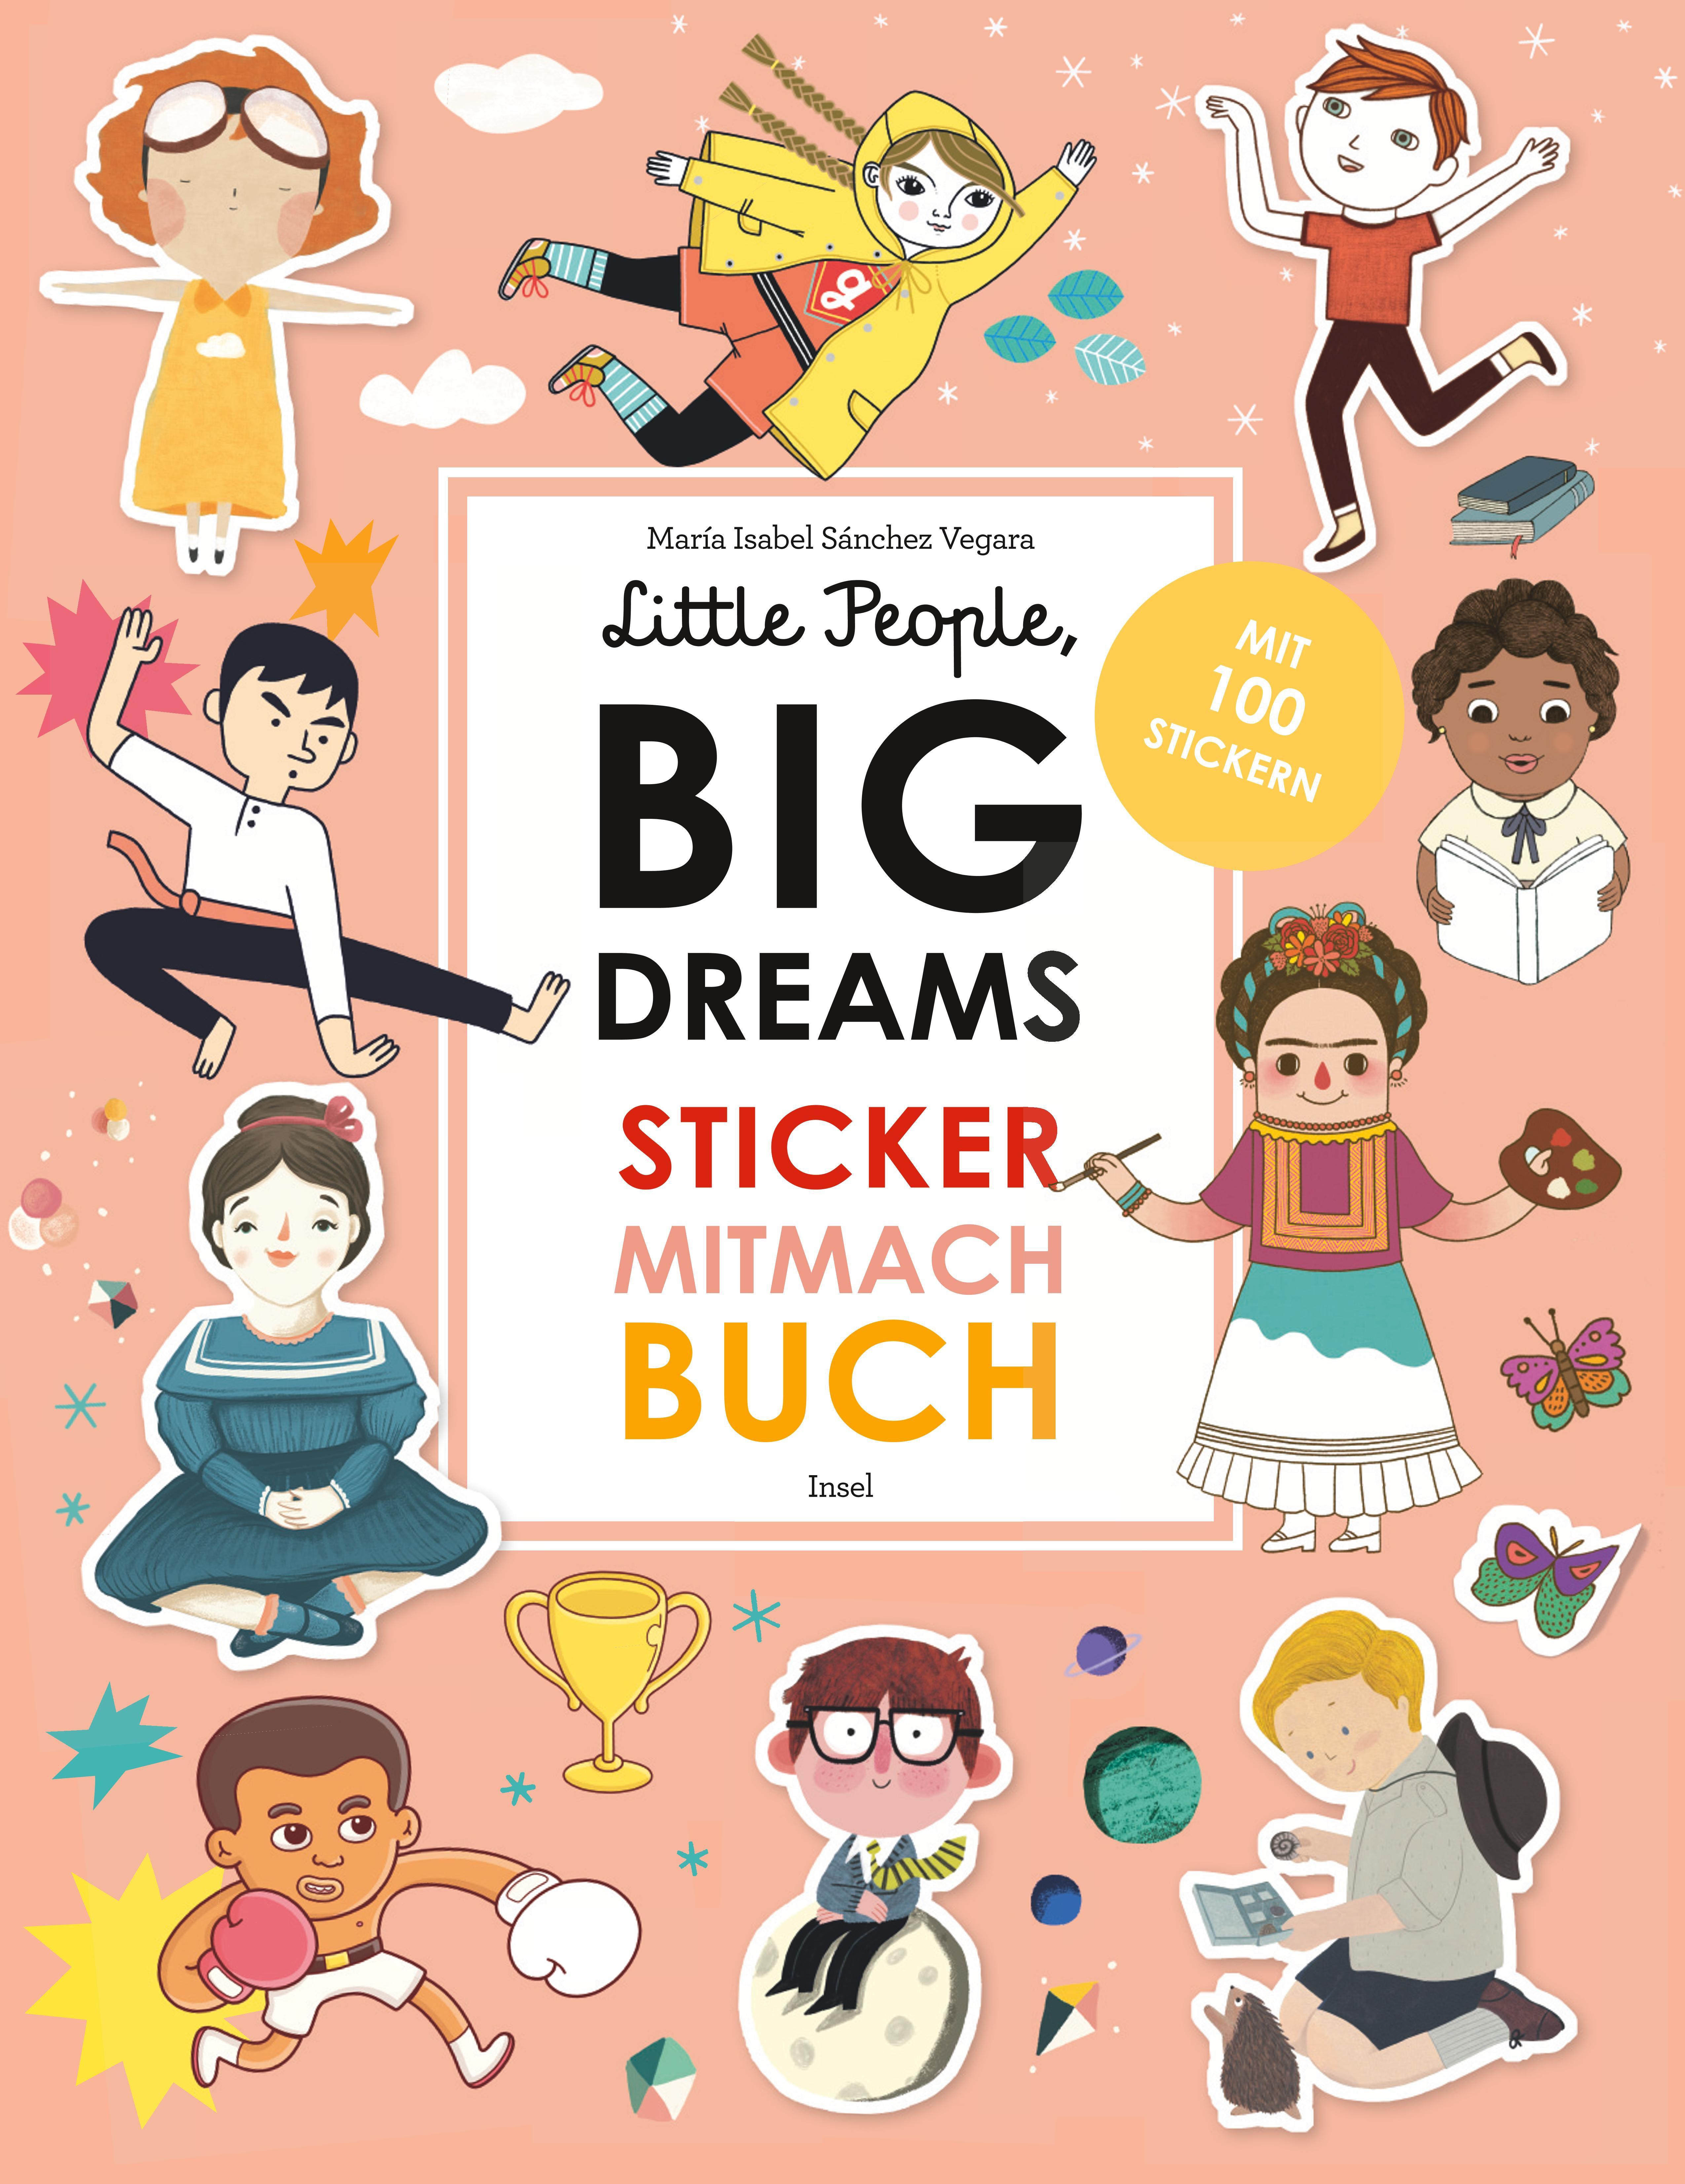 Little People, BIG DREAMS - Sticker-Mitmach-Buch